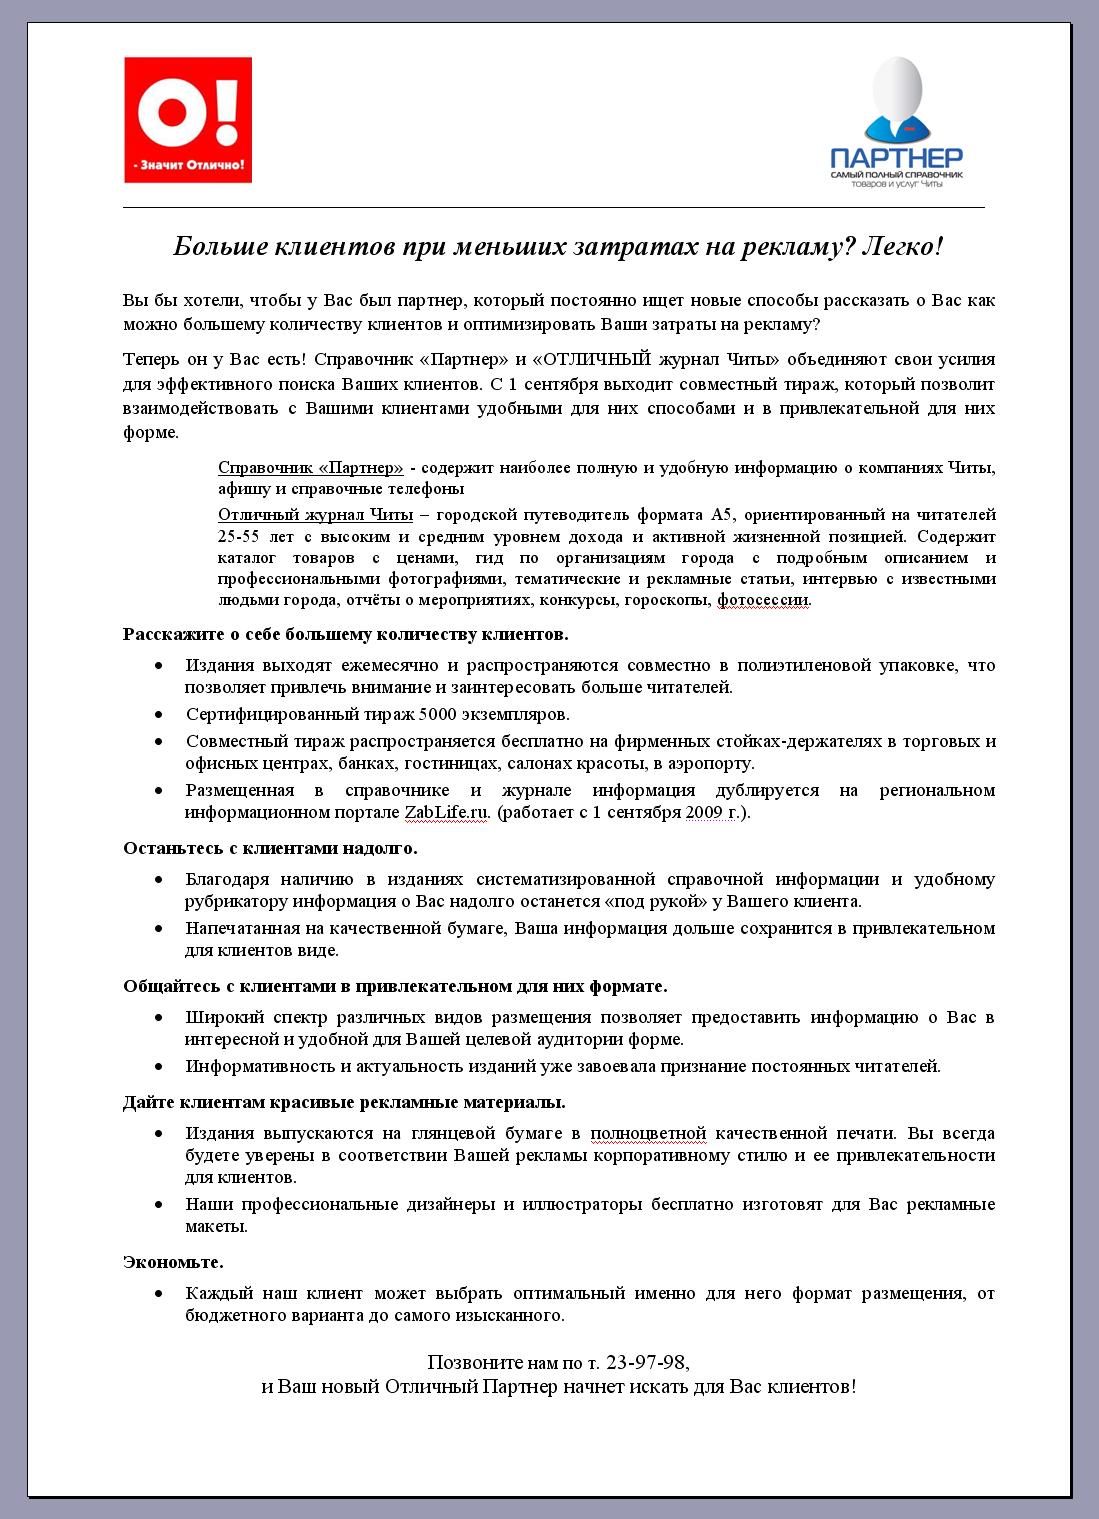 Коммерческое предложение Заблайф v3